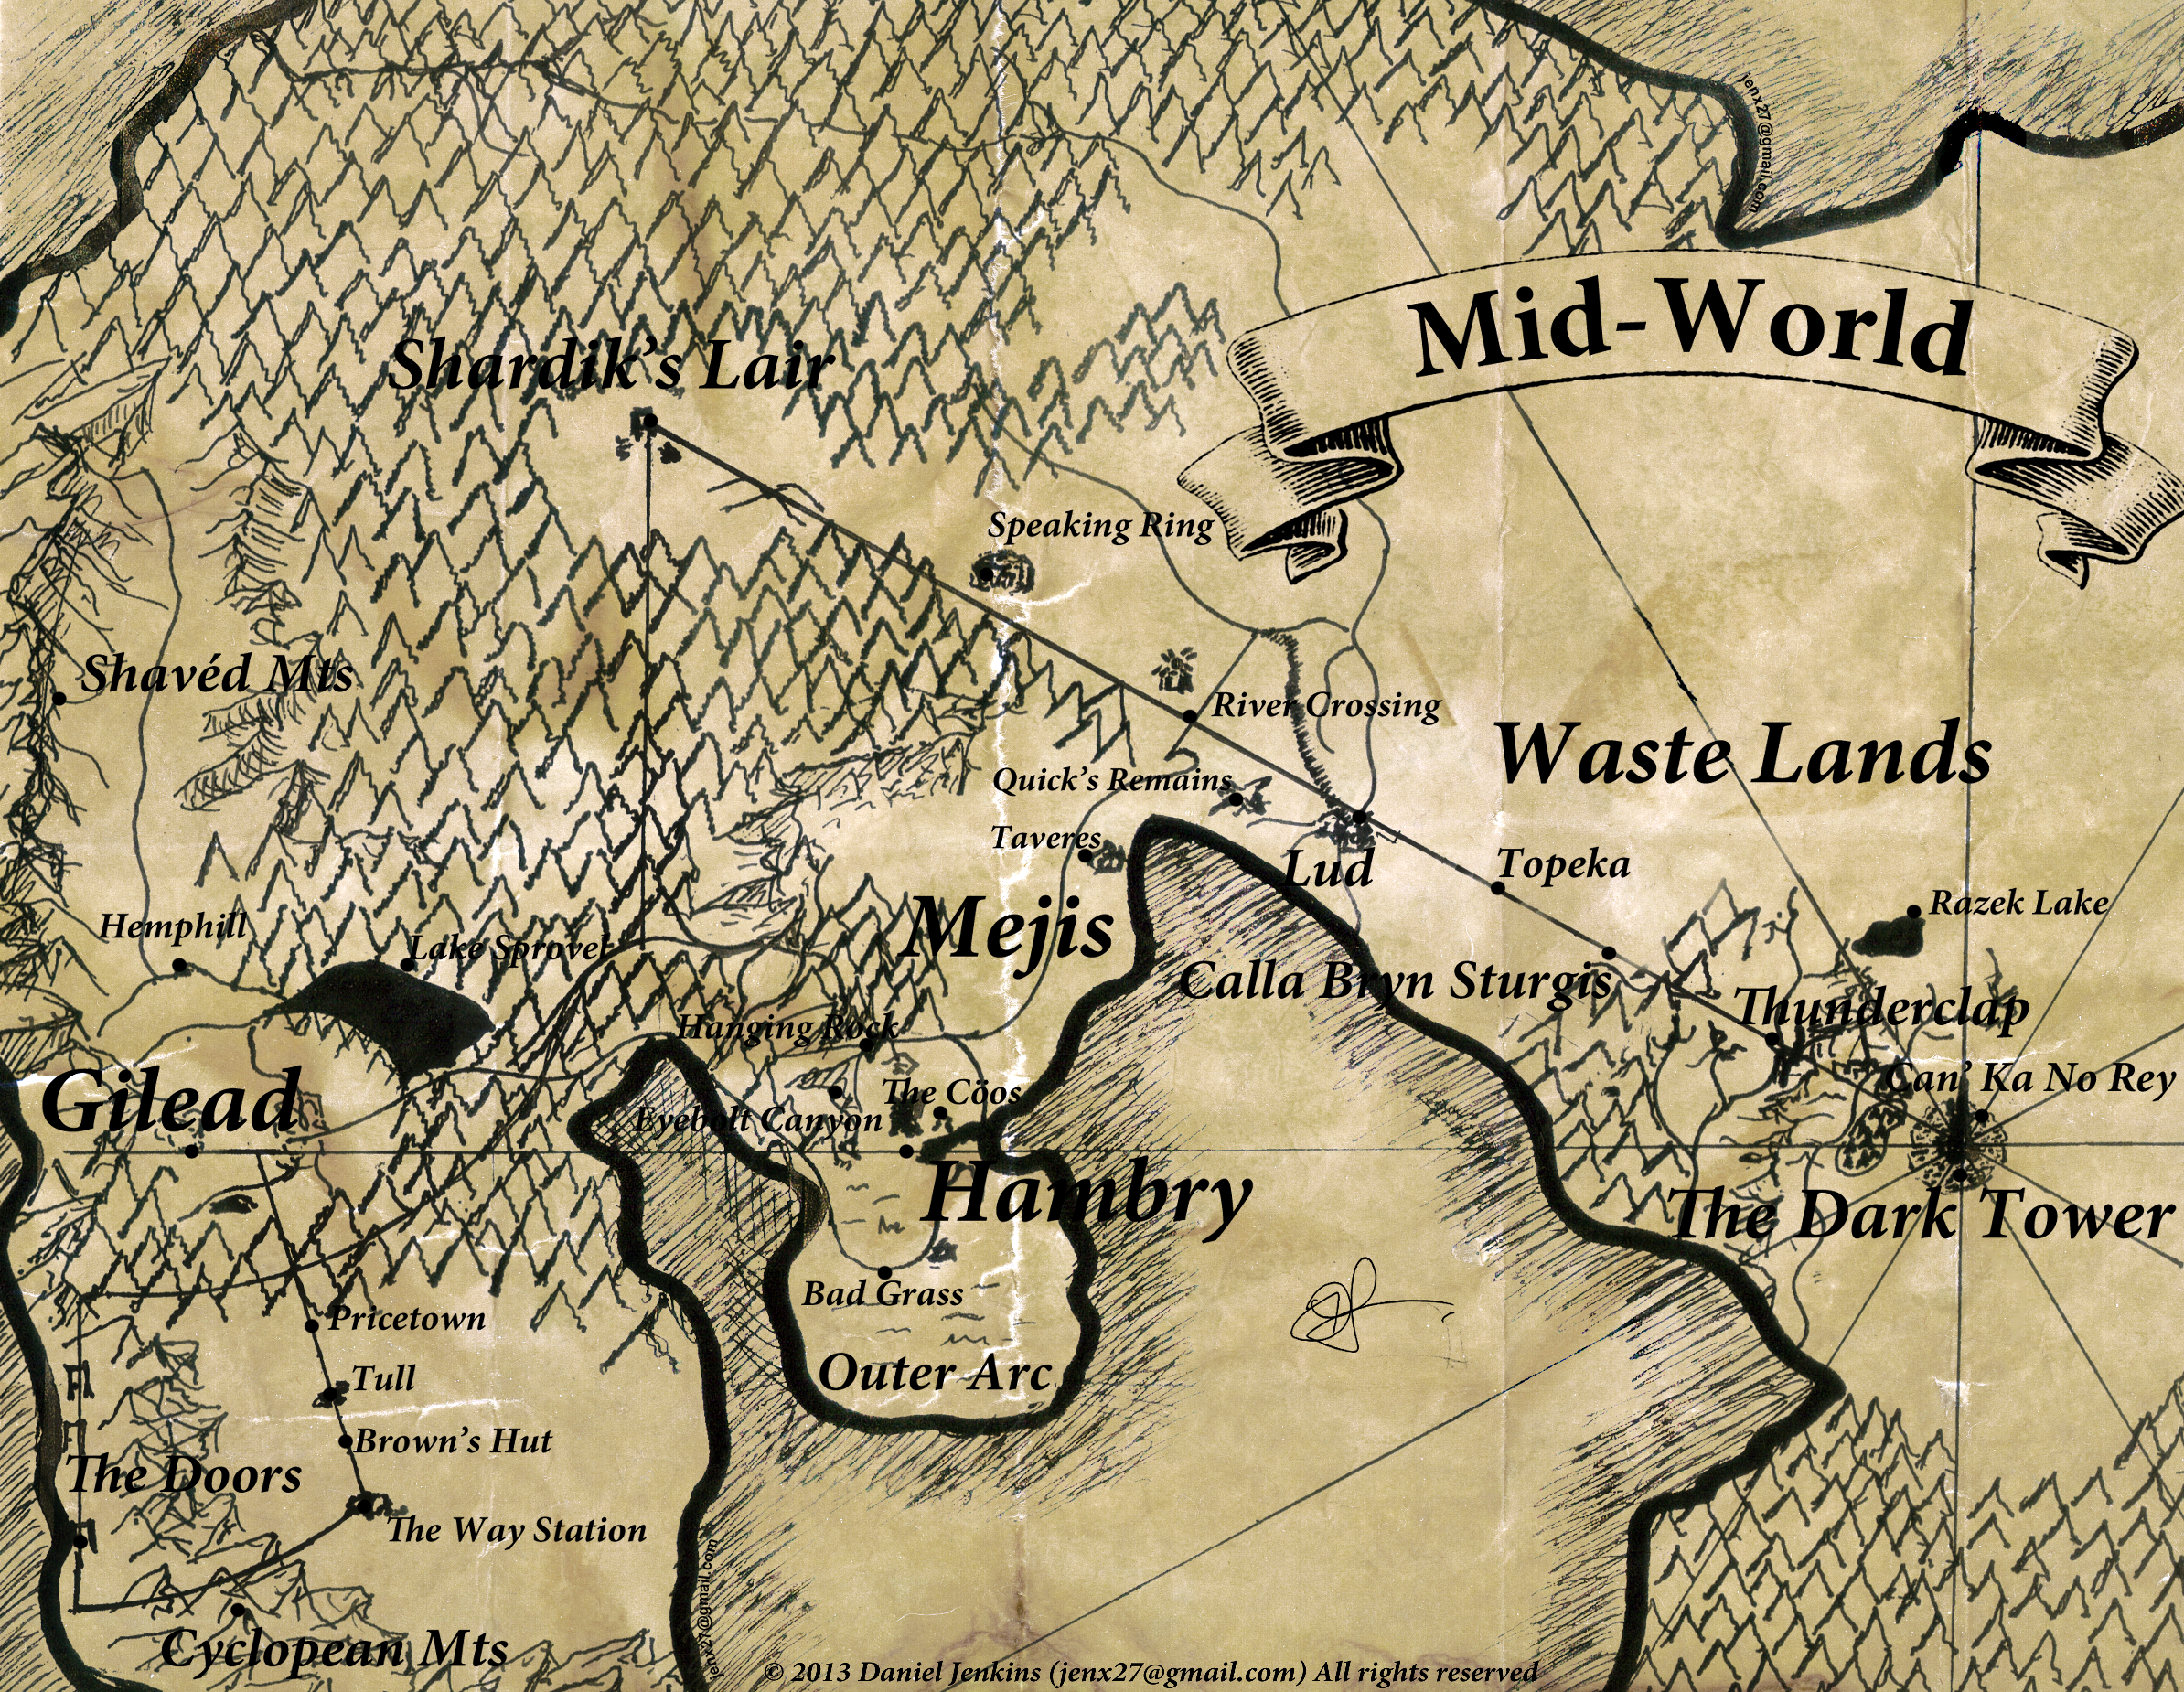 Mid-World